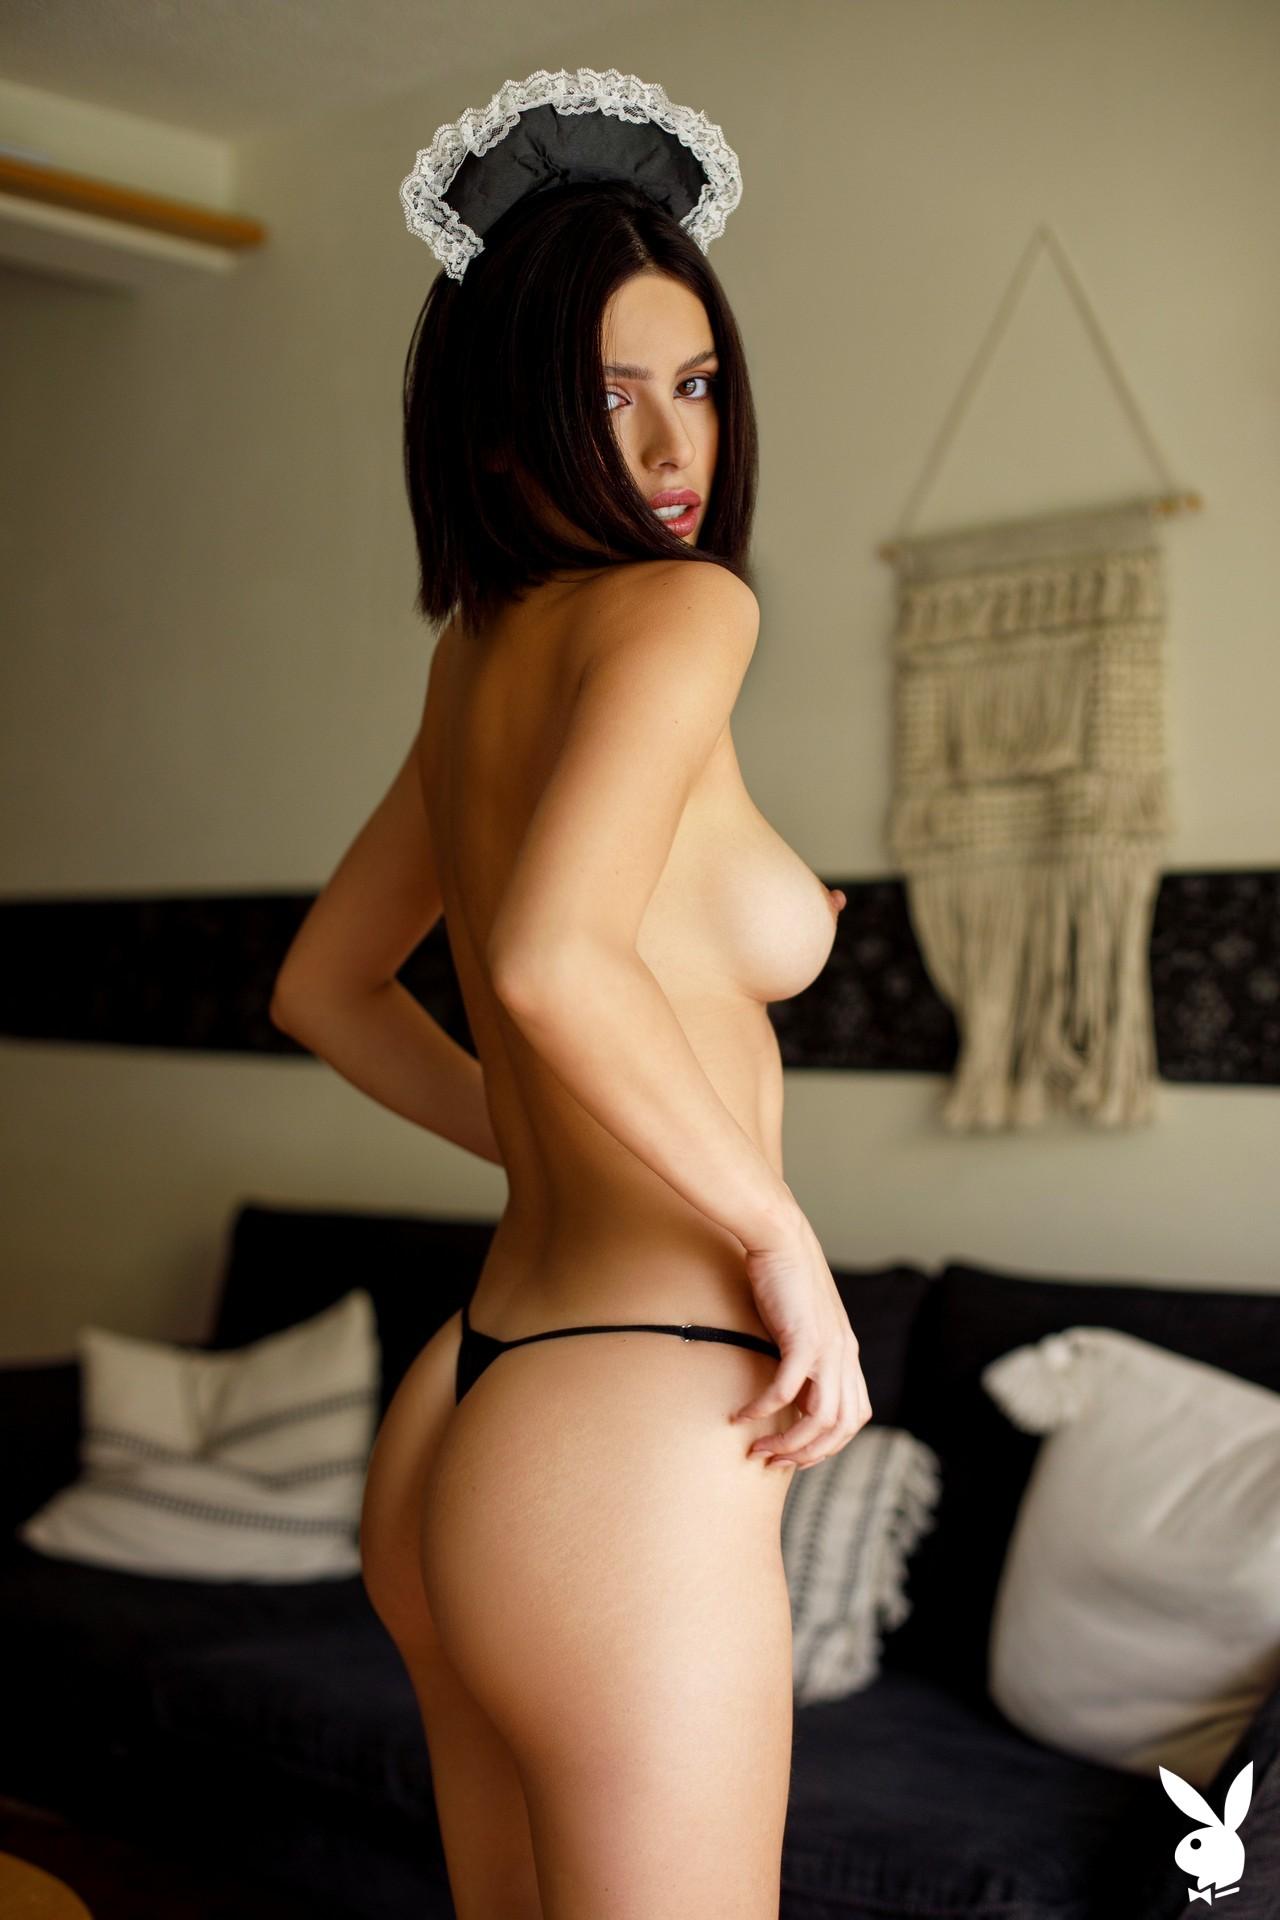 Fernanda Pacheco In Domestic Bliss Playboy Plus (12)